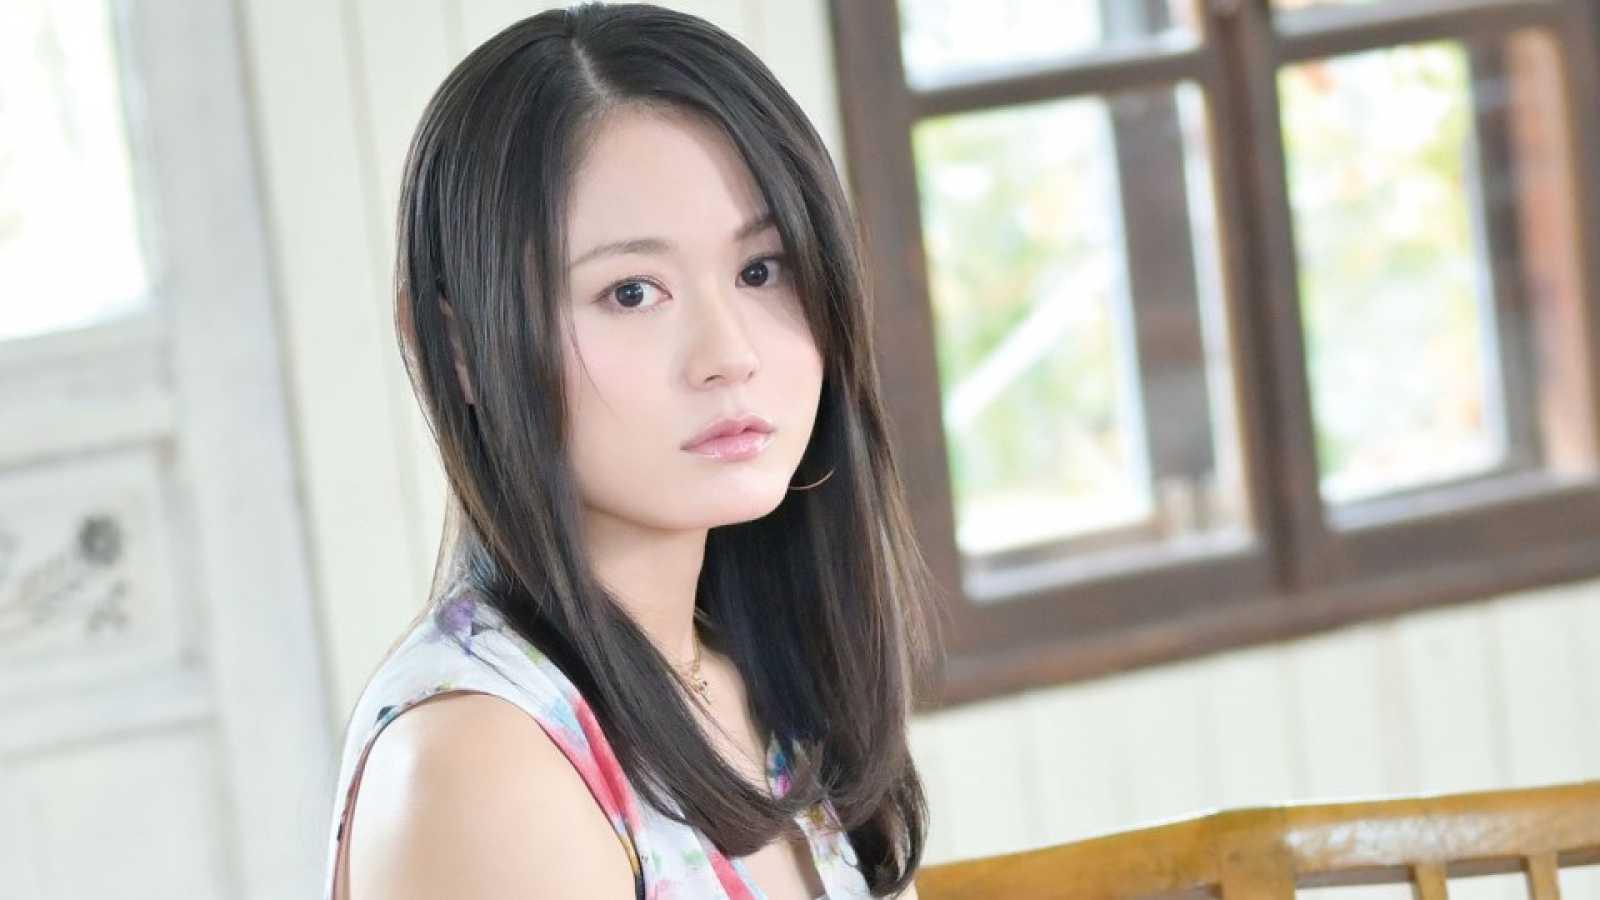 Nuevo álbum de Kaori Oda © TEAM Entertainment Inc. All rights reserved.